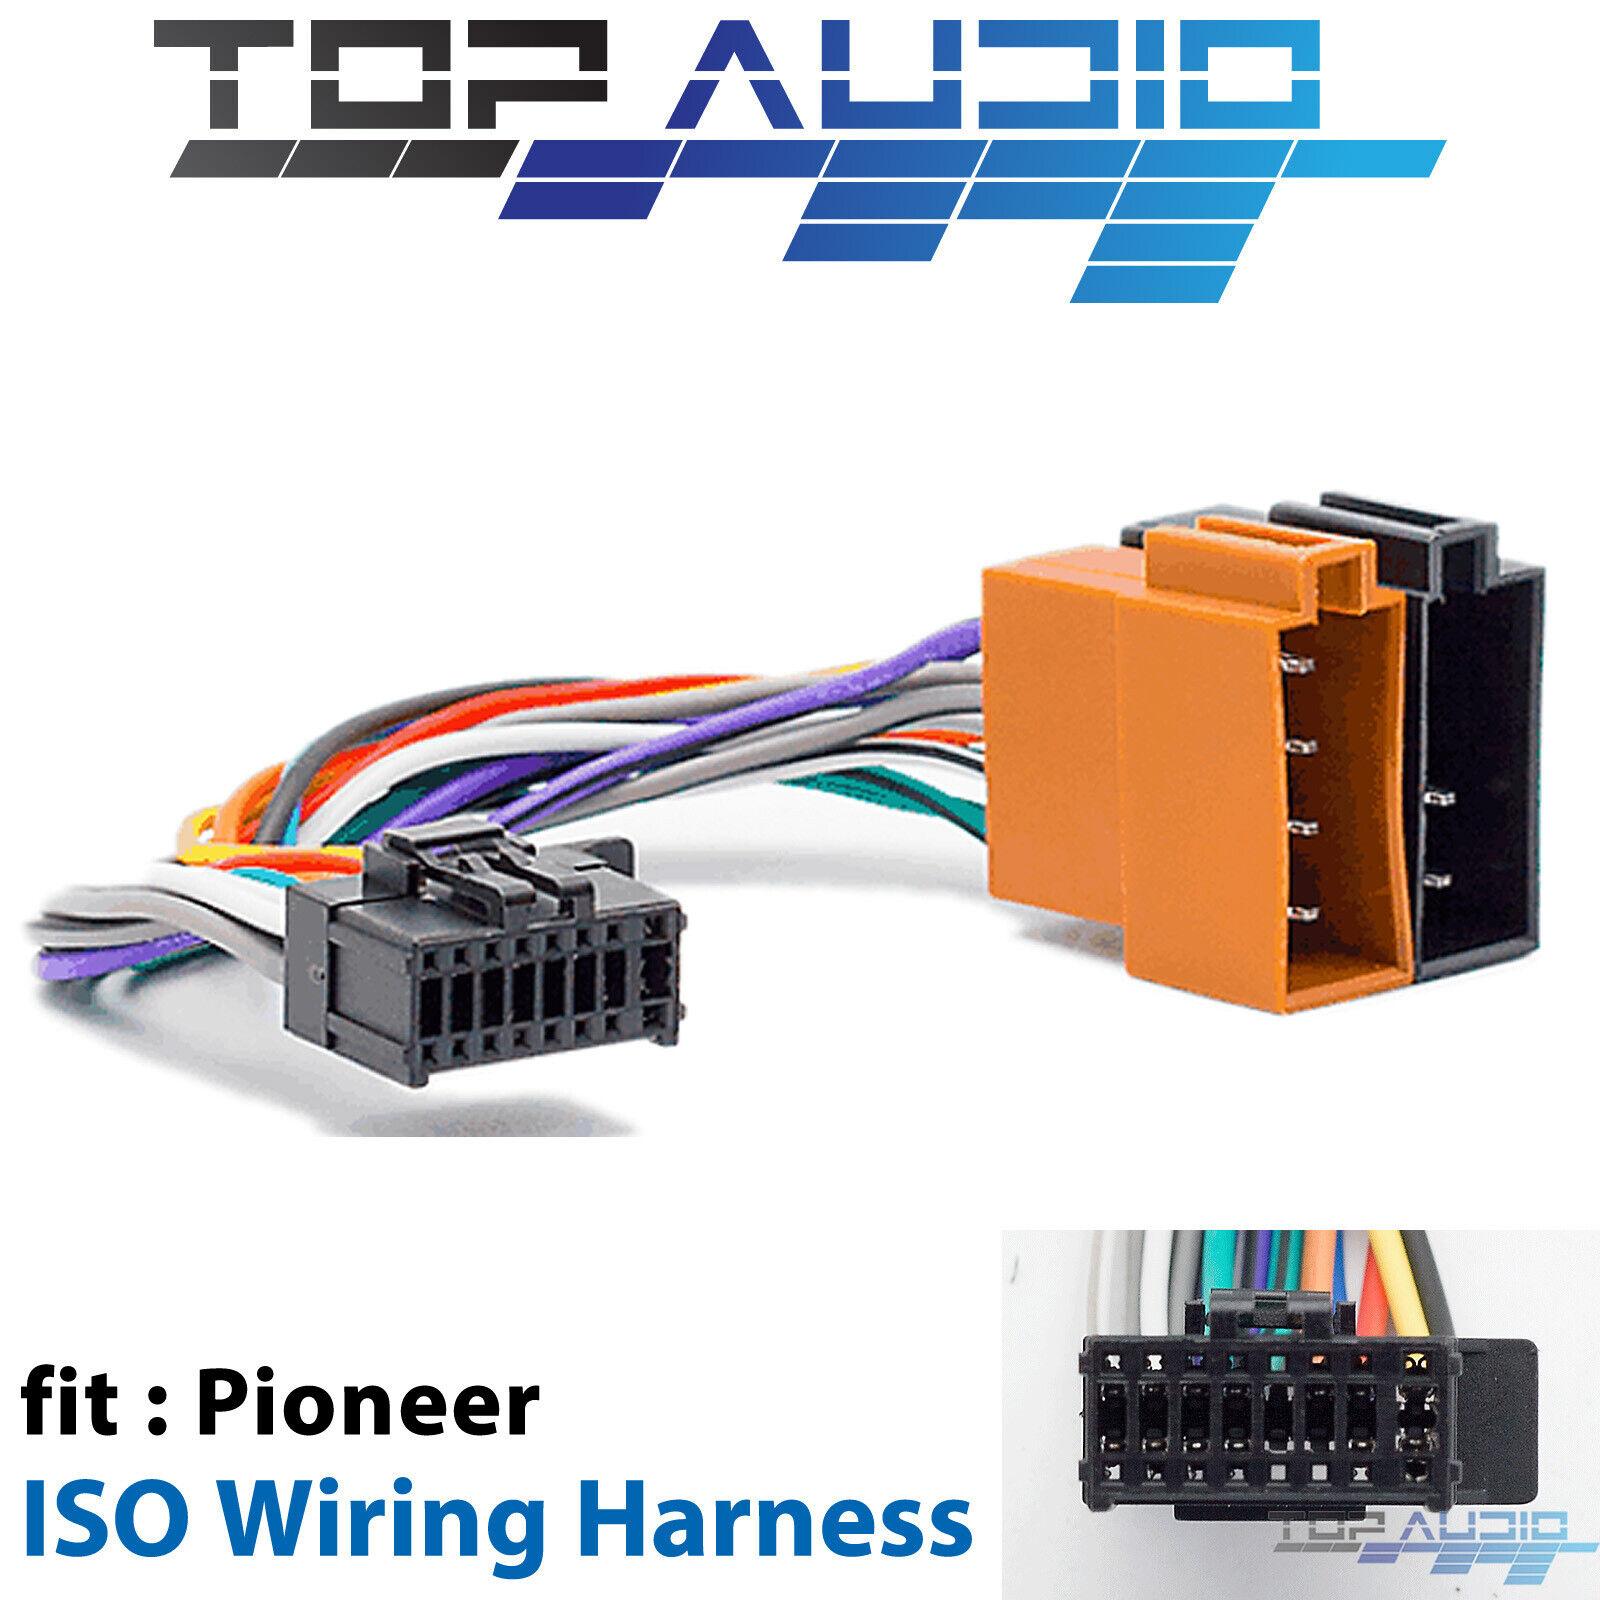 Pioneer ISO Wiring Harness fit MVH-X175UI DEH-X1750 DEH-X2750UI MVH-X375BT  for sale onlineeBay